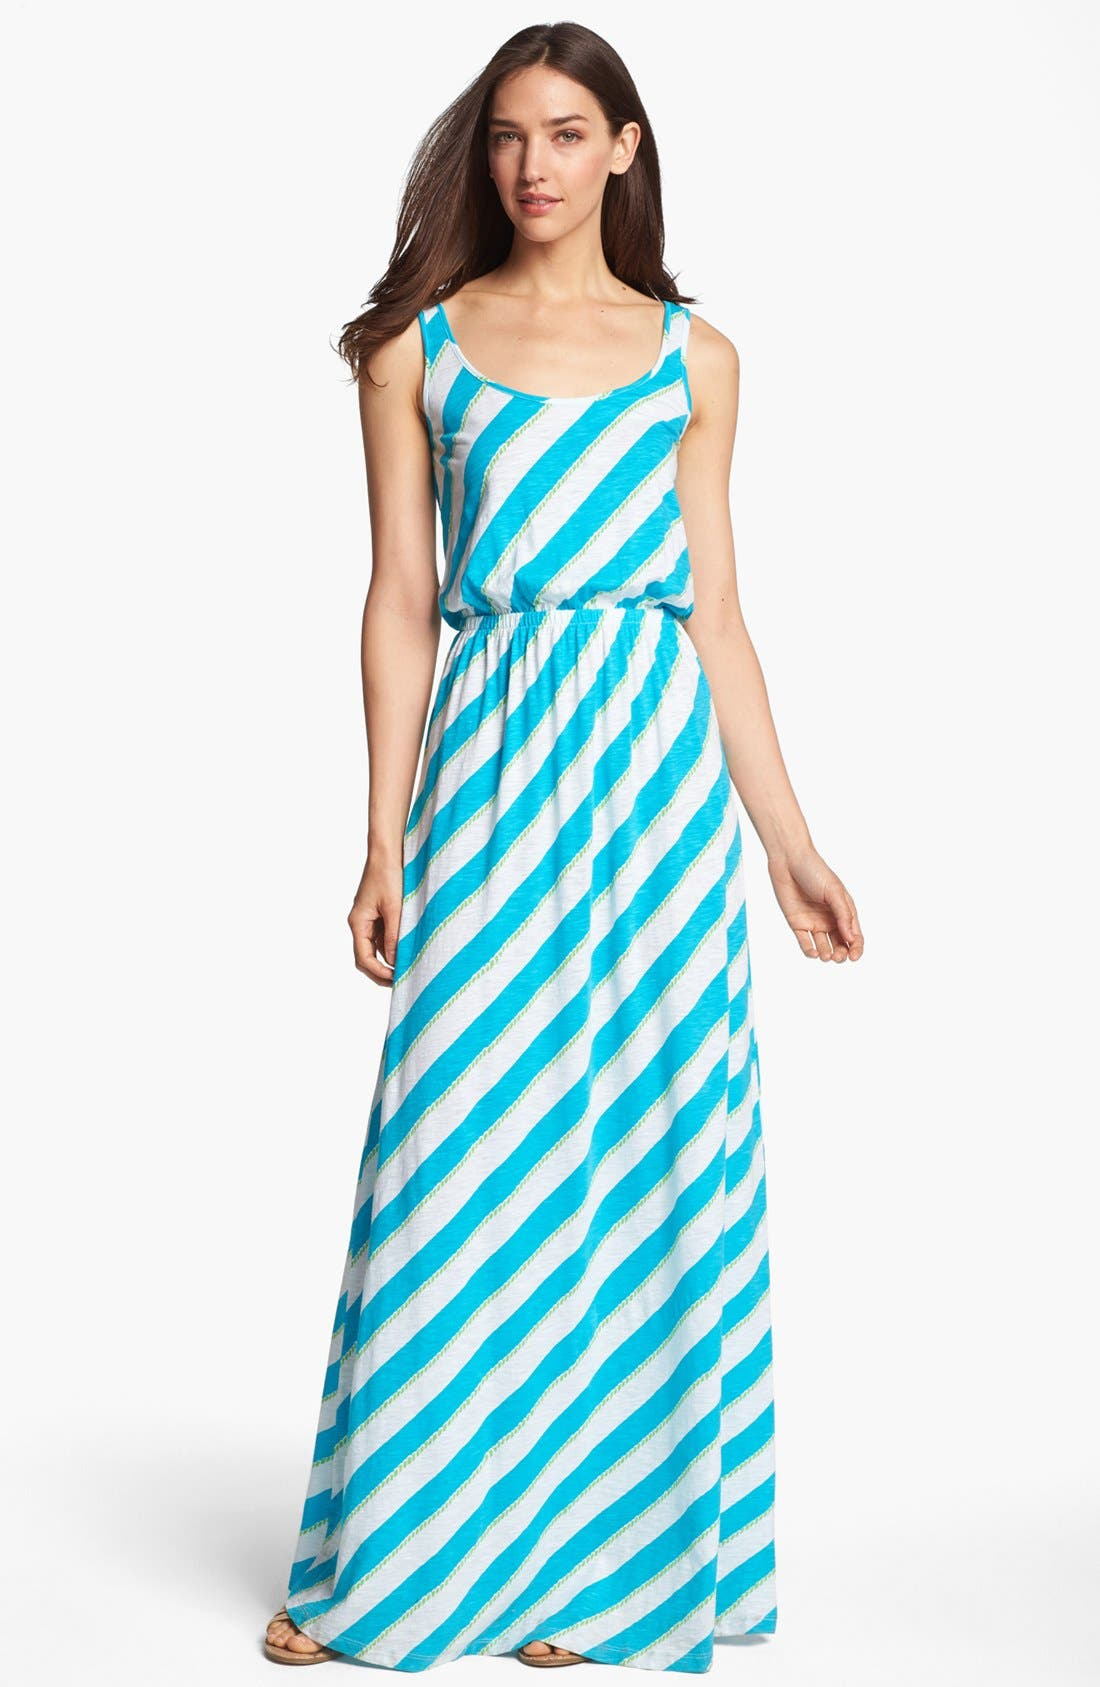 Main Image - Lilly Pulitzer® 'Tria' Stripe Cotton Maxi Dress